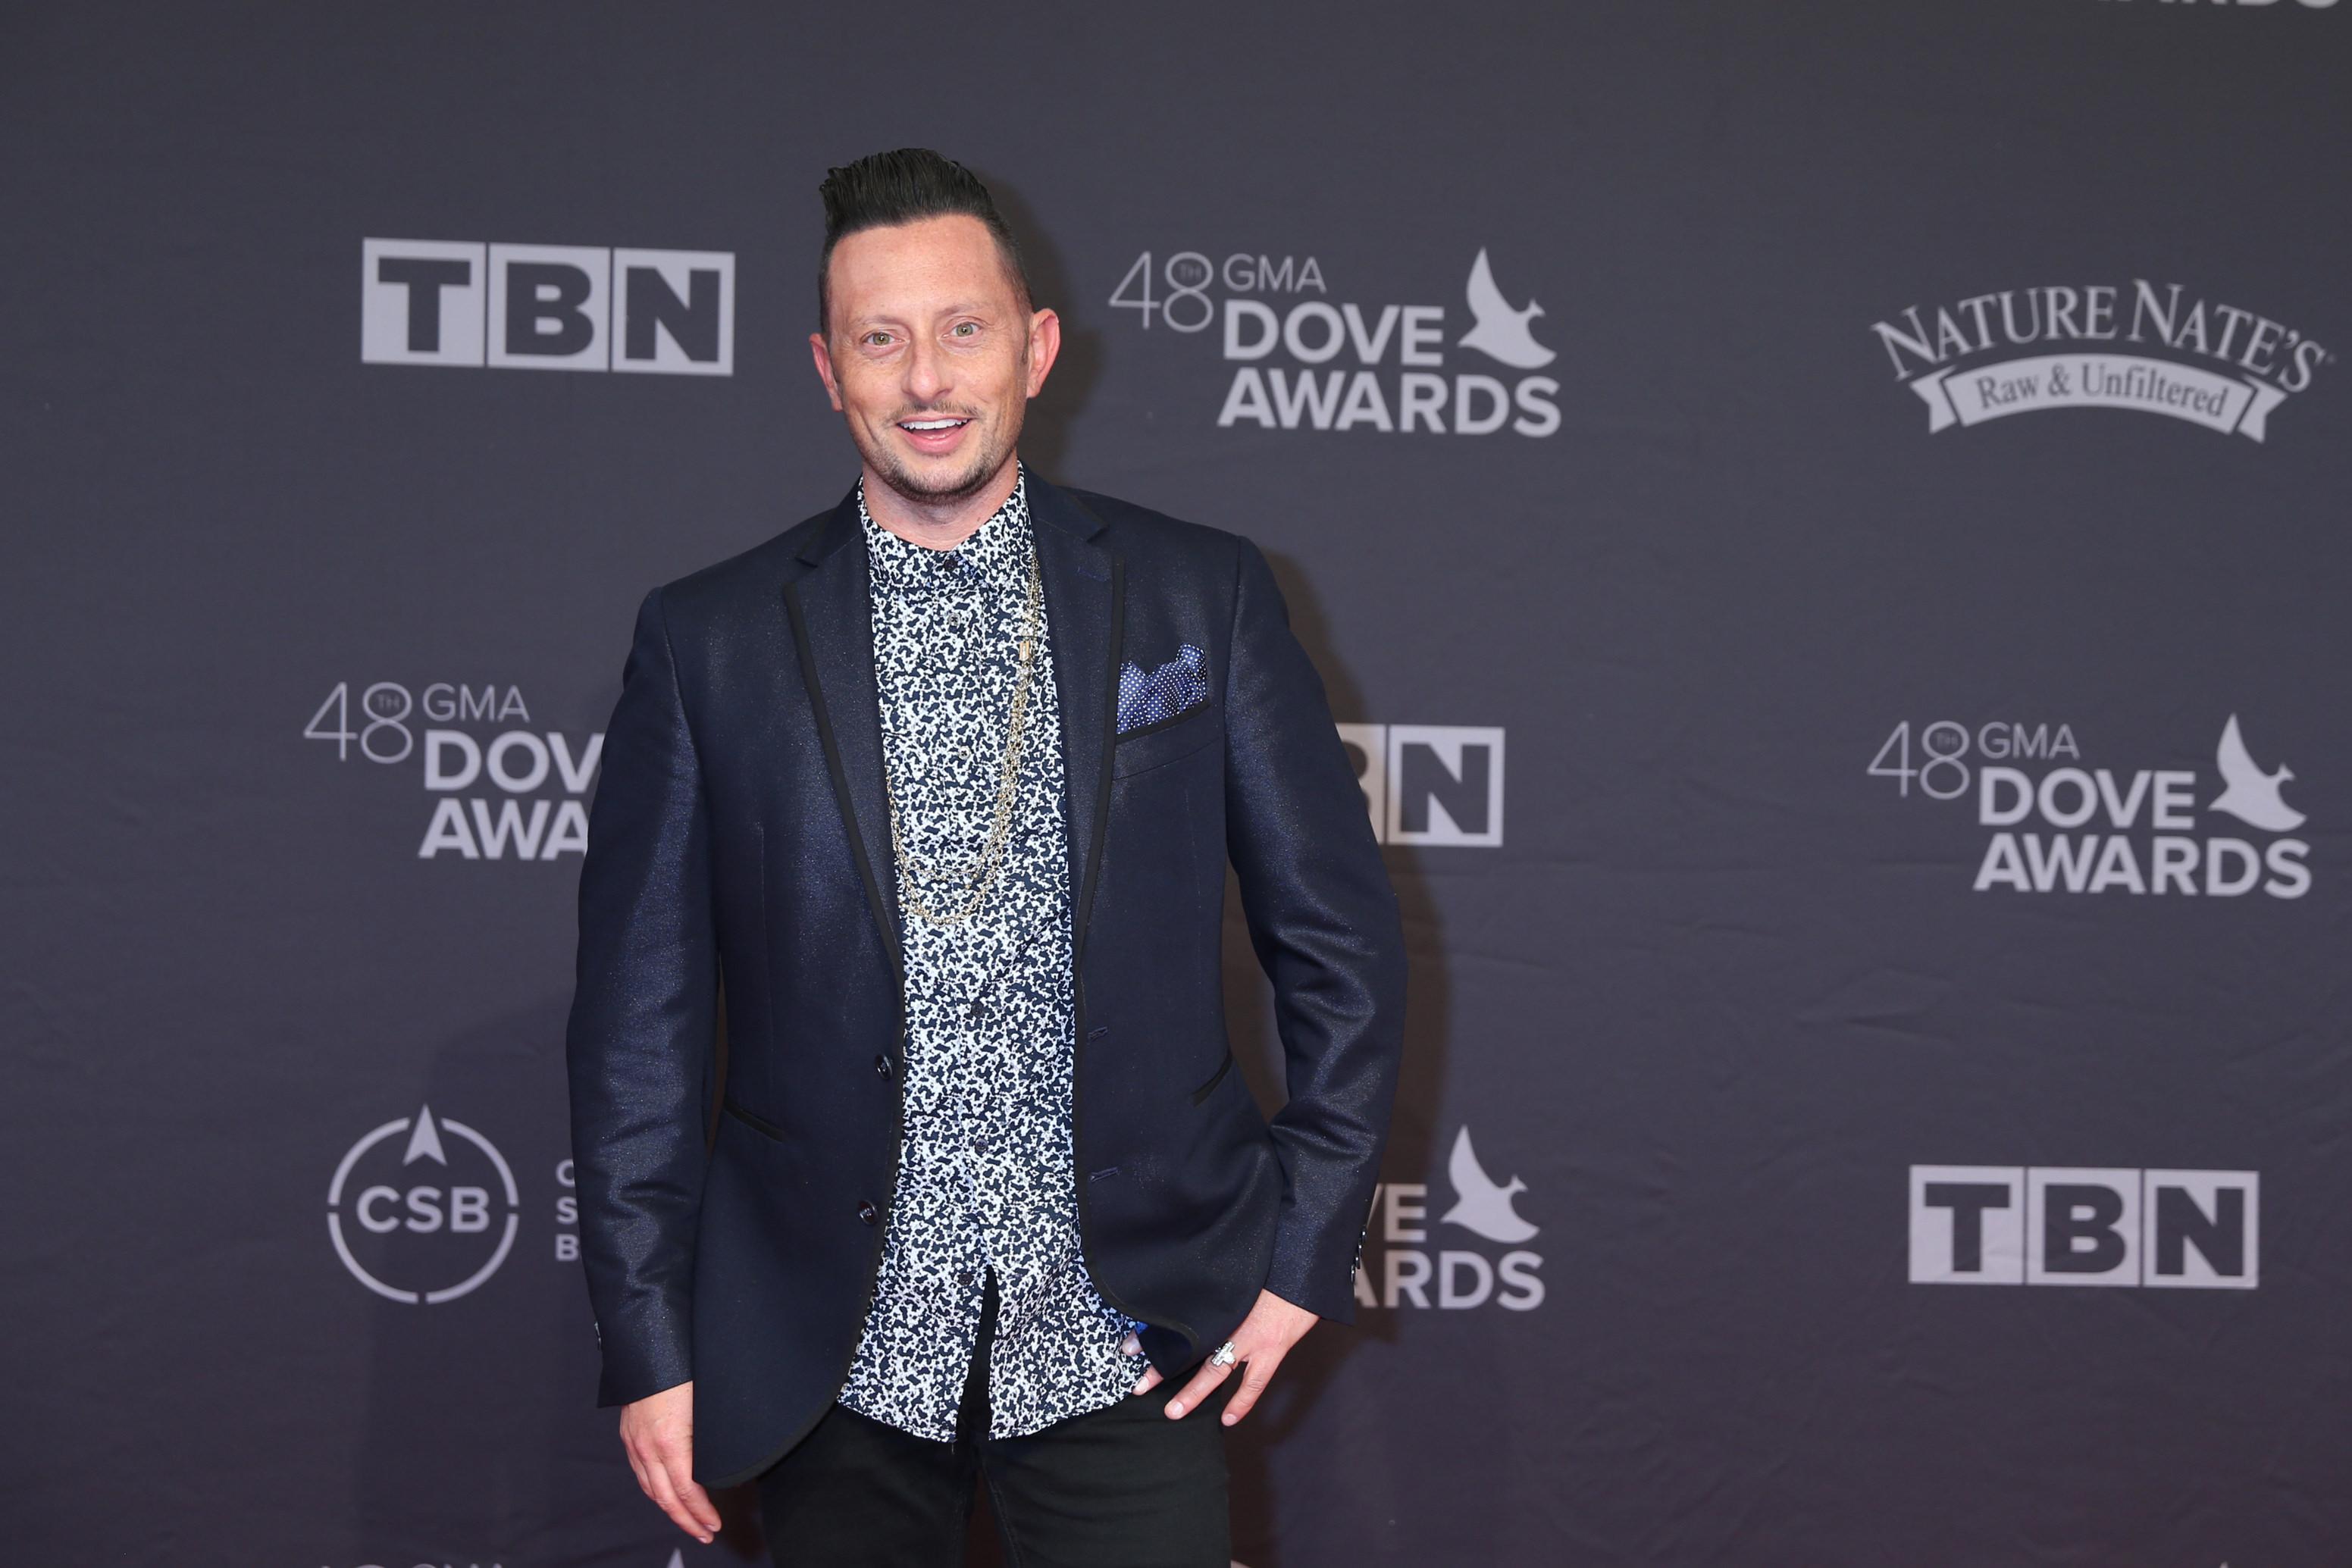 ENTERTAINMENT: OCT 17 GMA Dove Awards